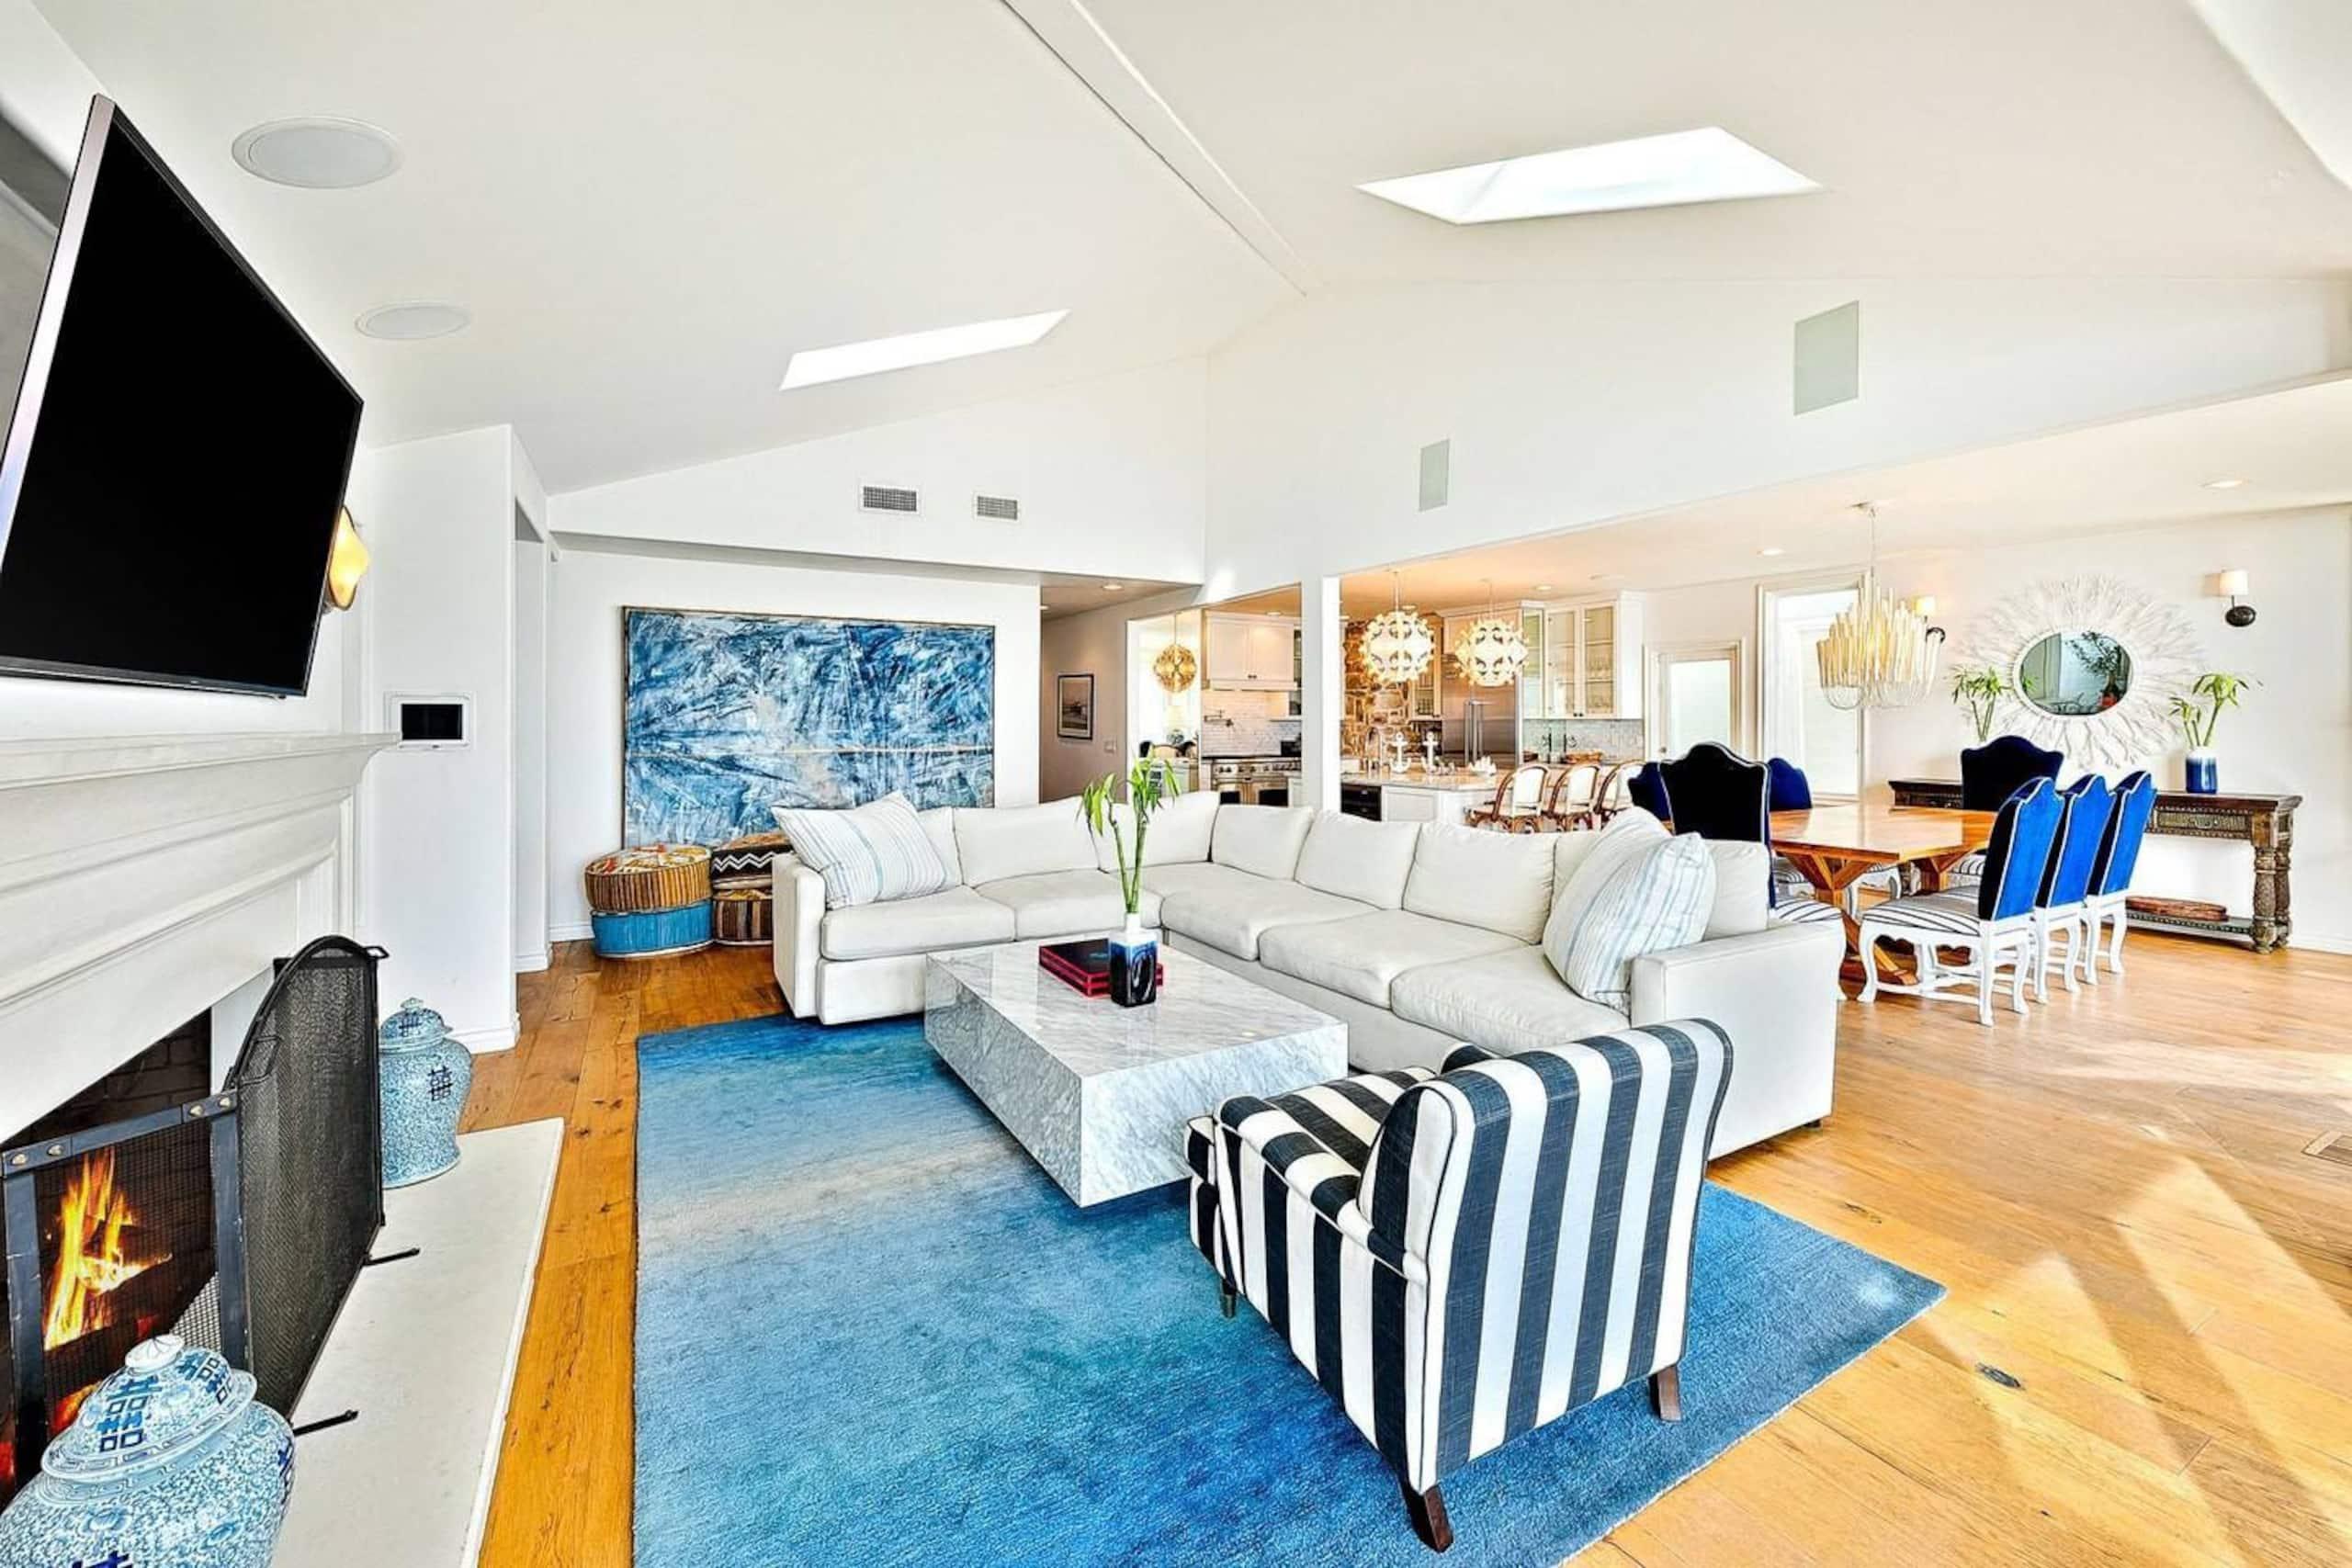 Apartment Villa Shawaiz - Beachfront Villa with 5 beds  photo 20352078